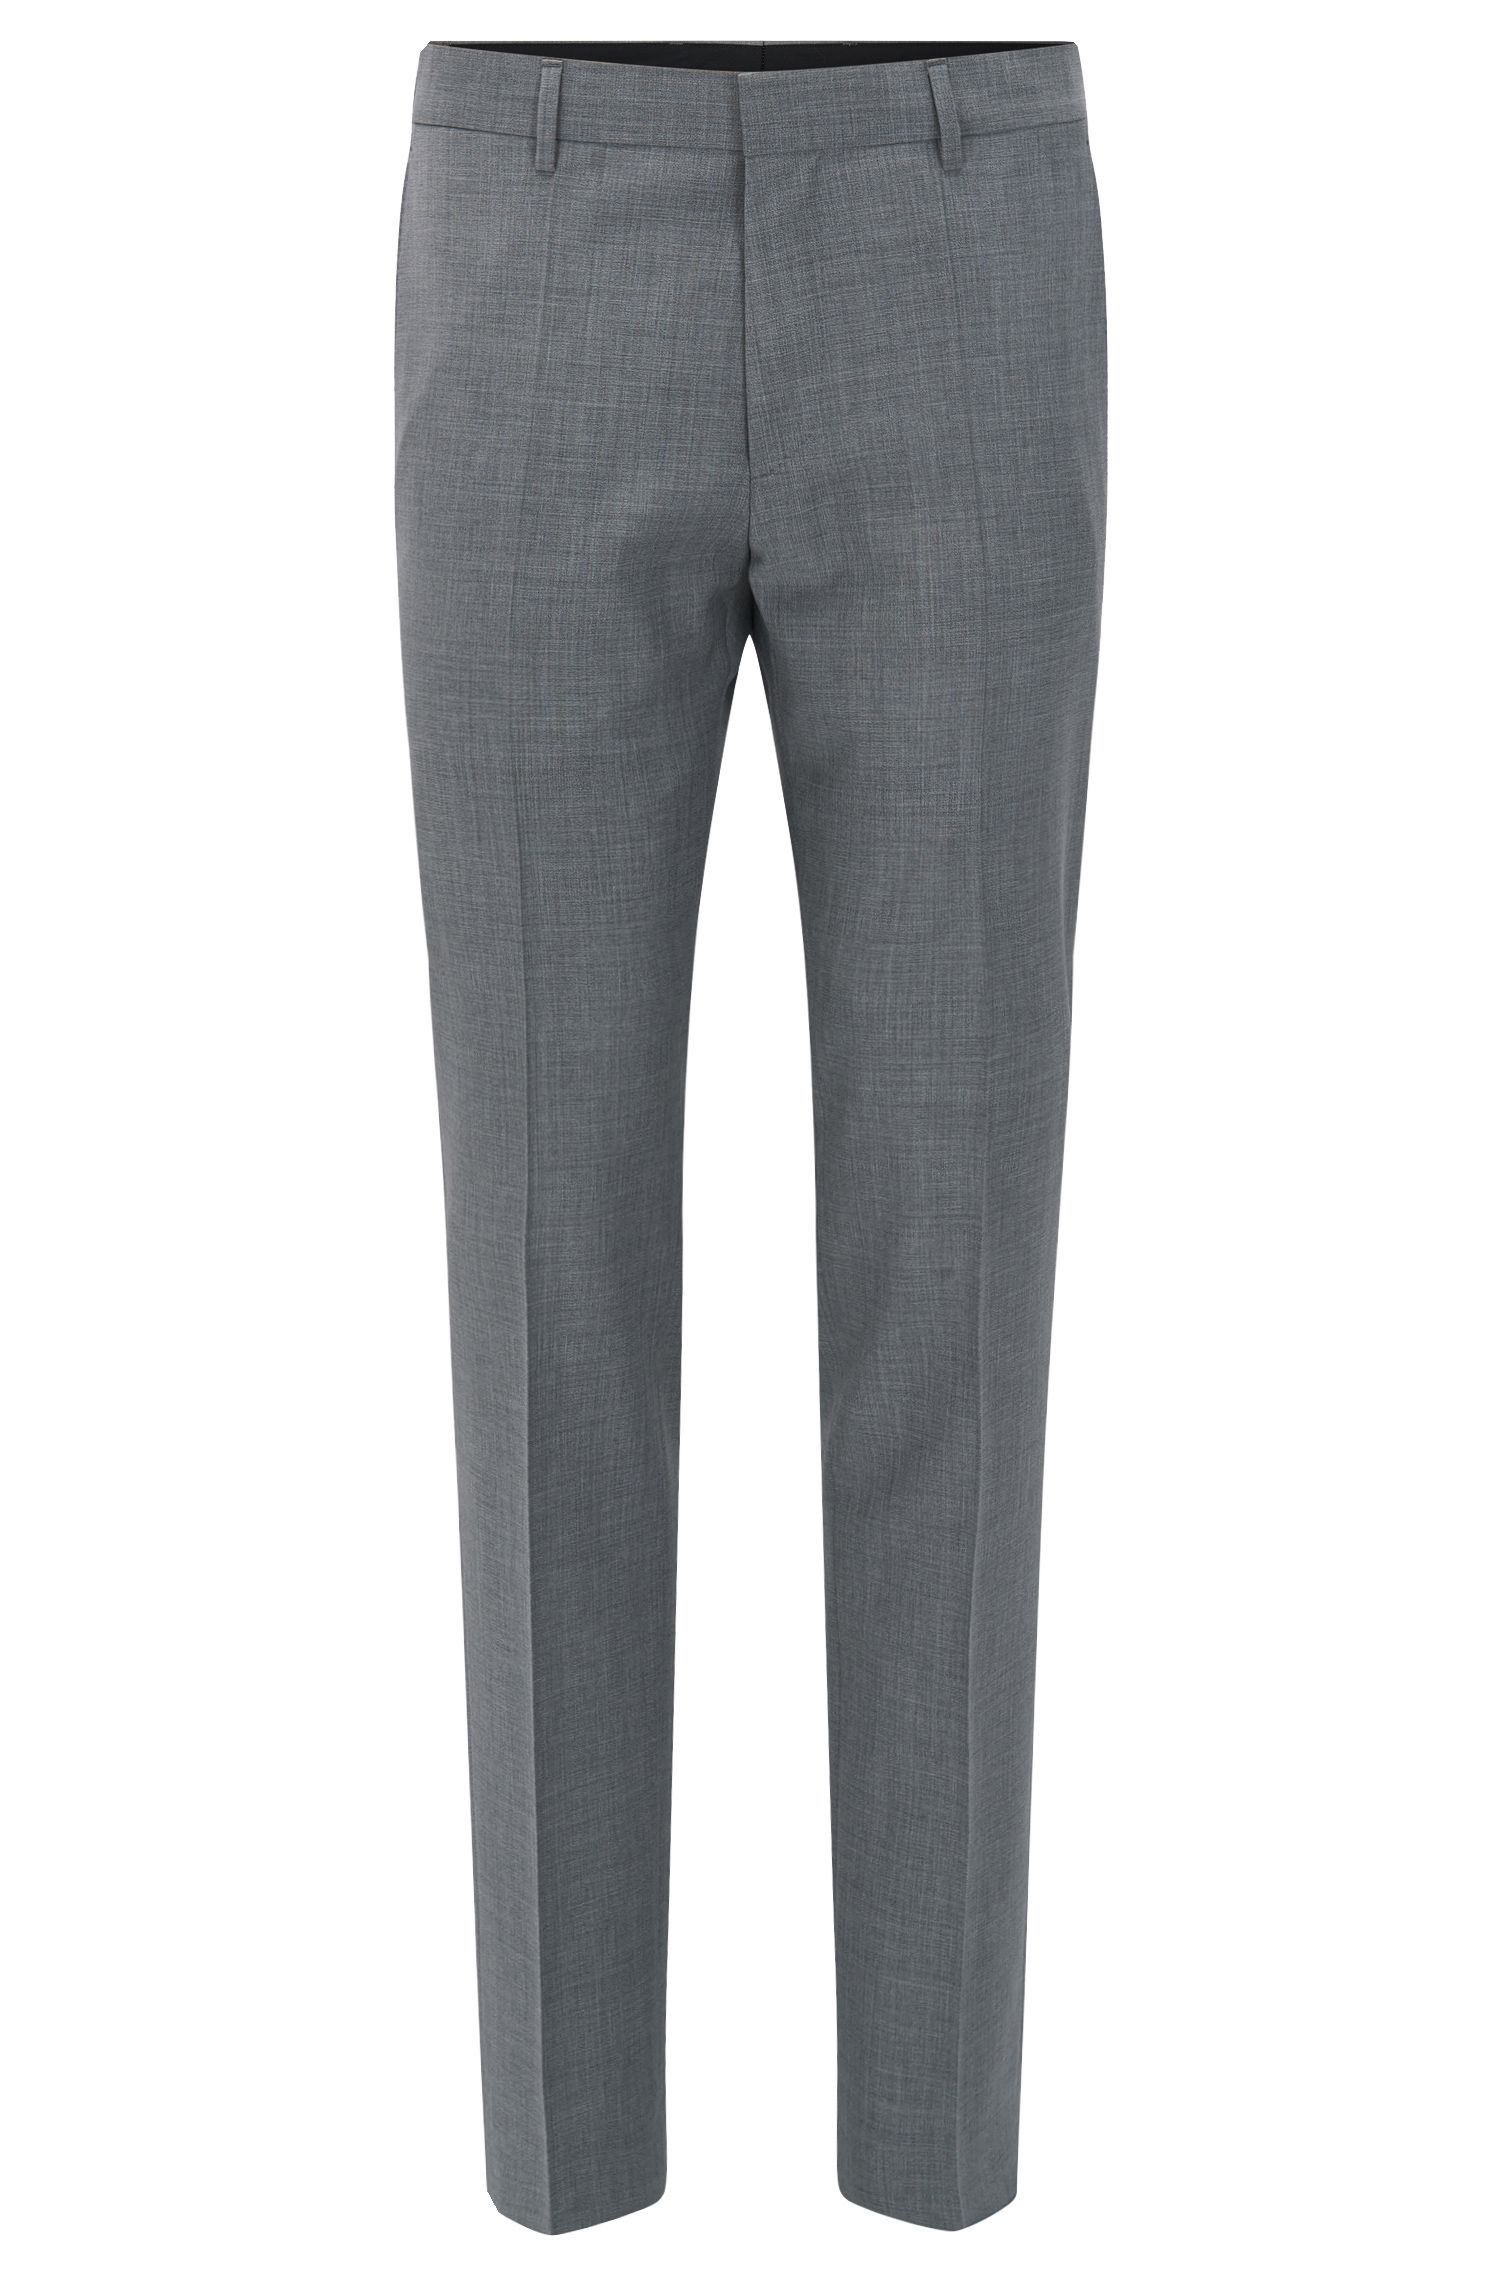 Virgin Wool Cashmere Dress Pant, Slim Fit | Genesis, Grey